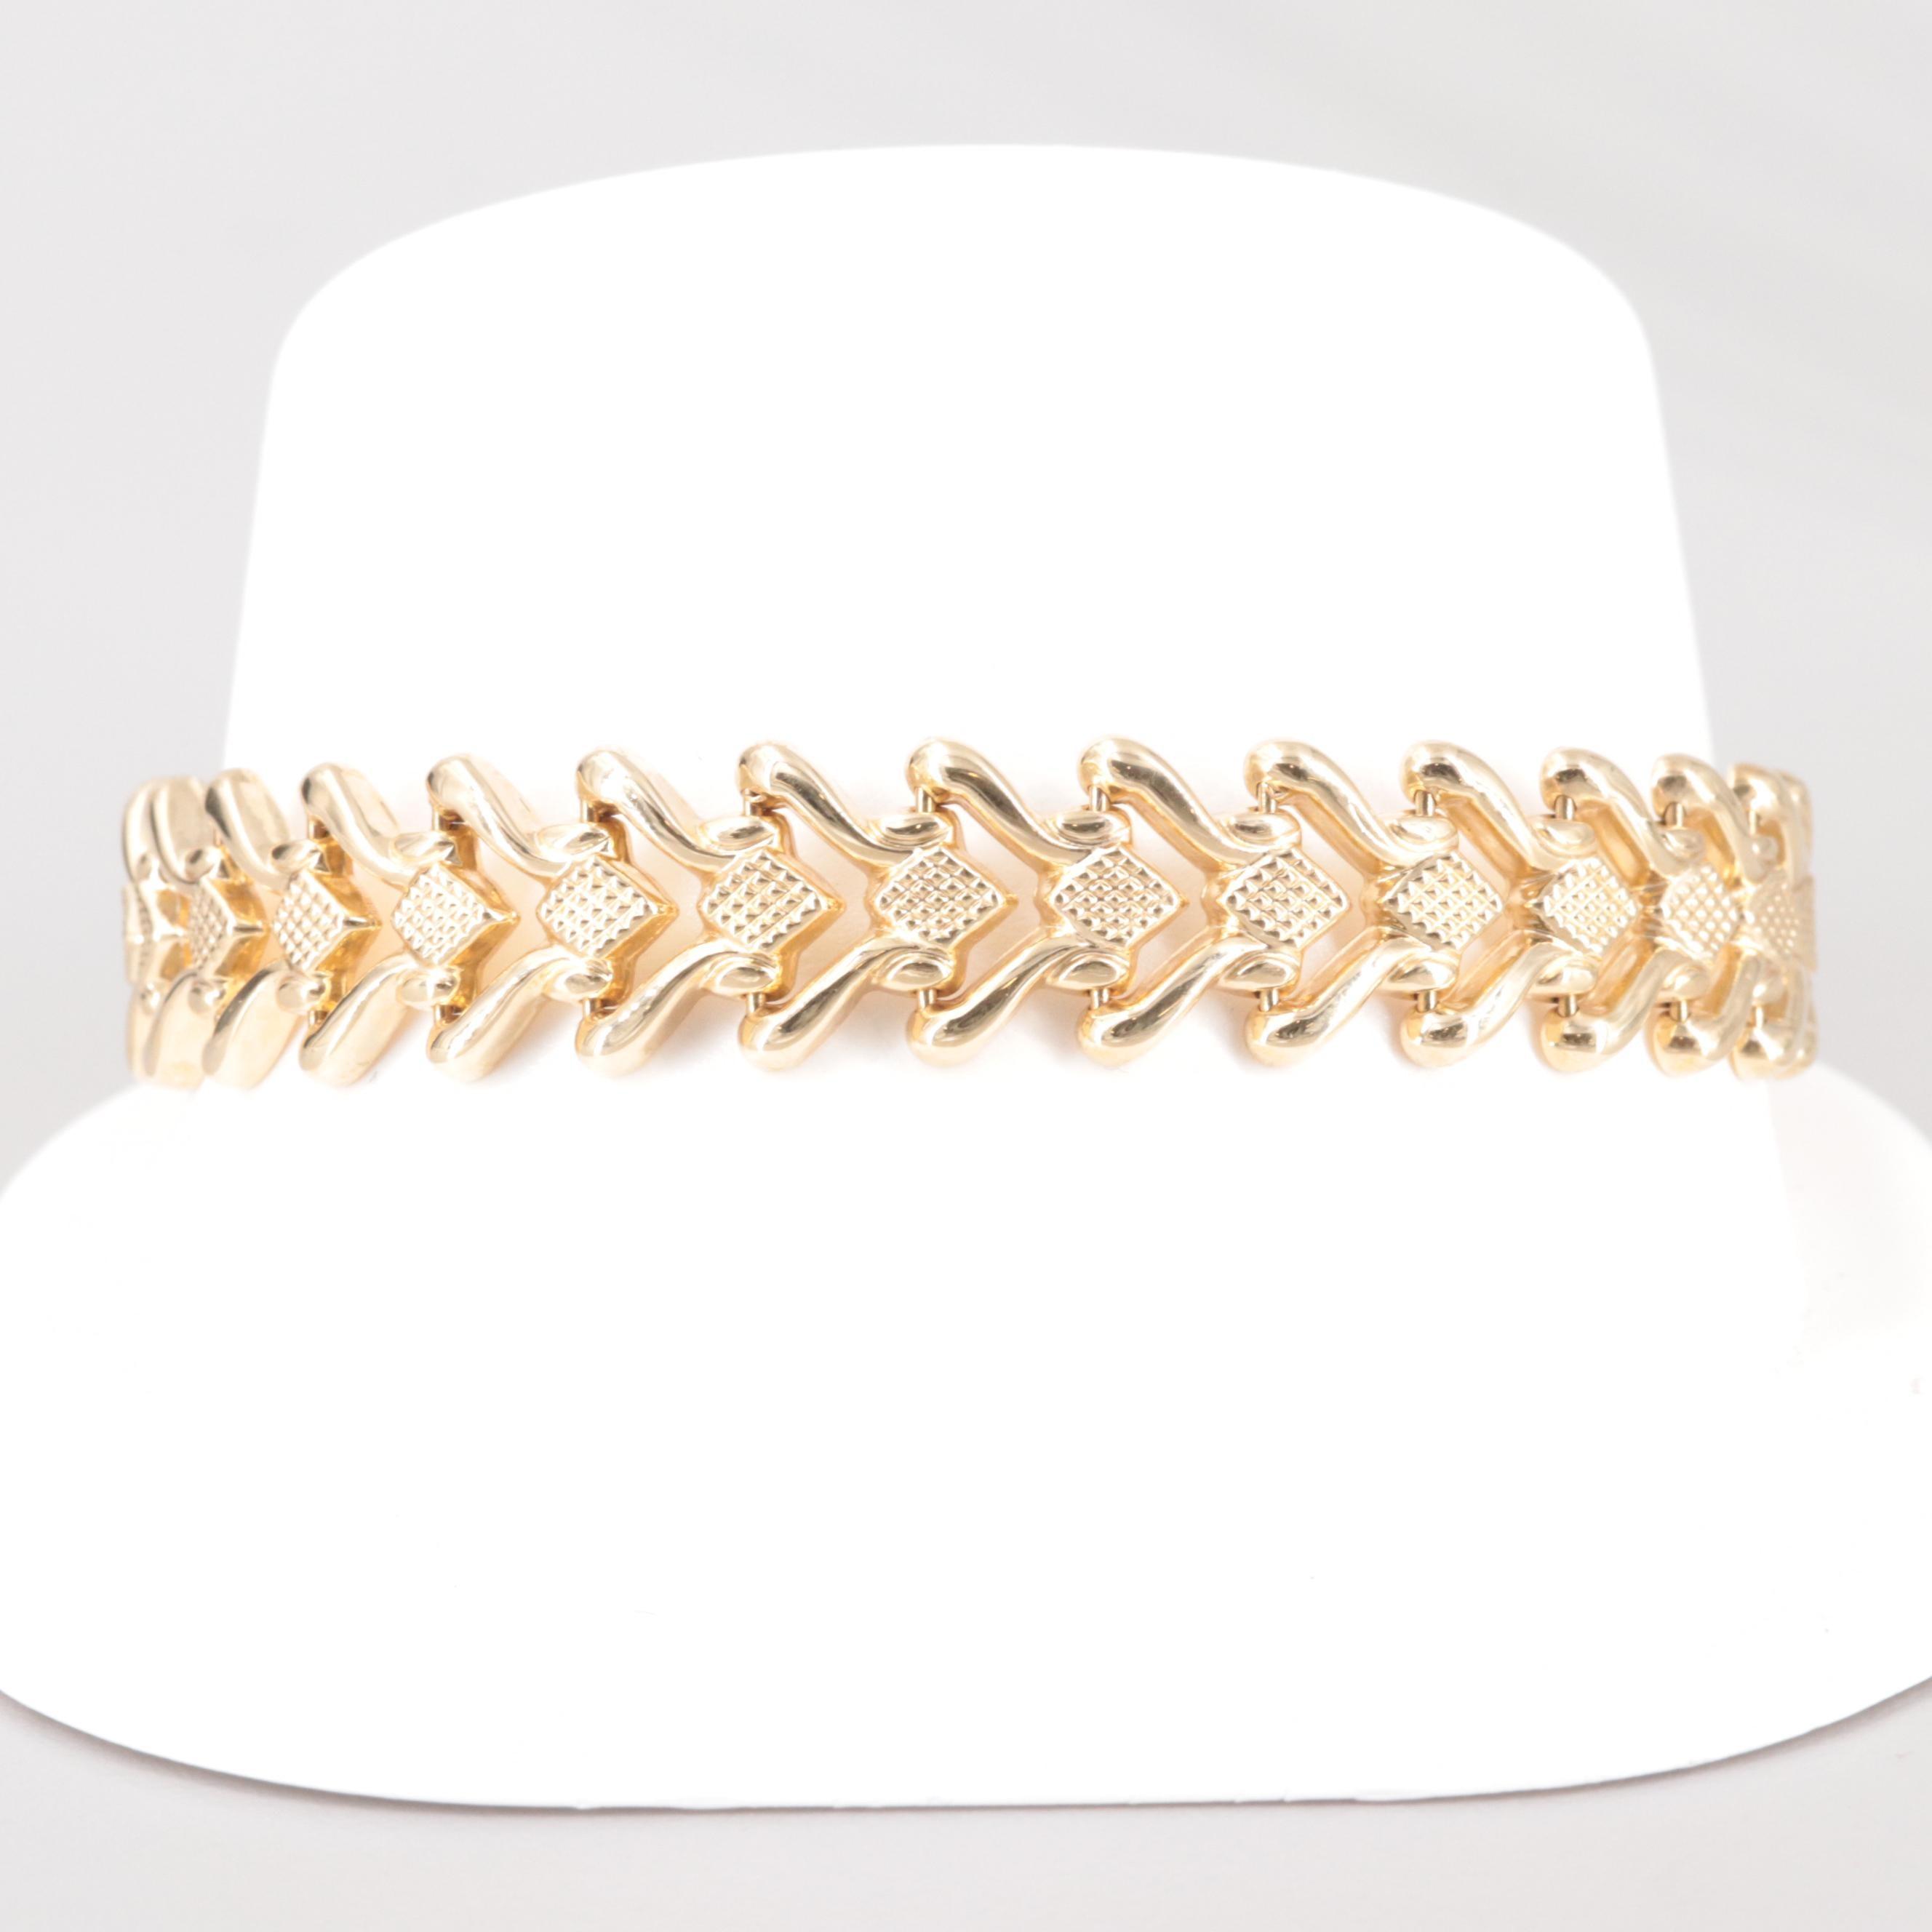 Aurafin 14K Yellow Gold Stampato Bracelet